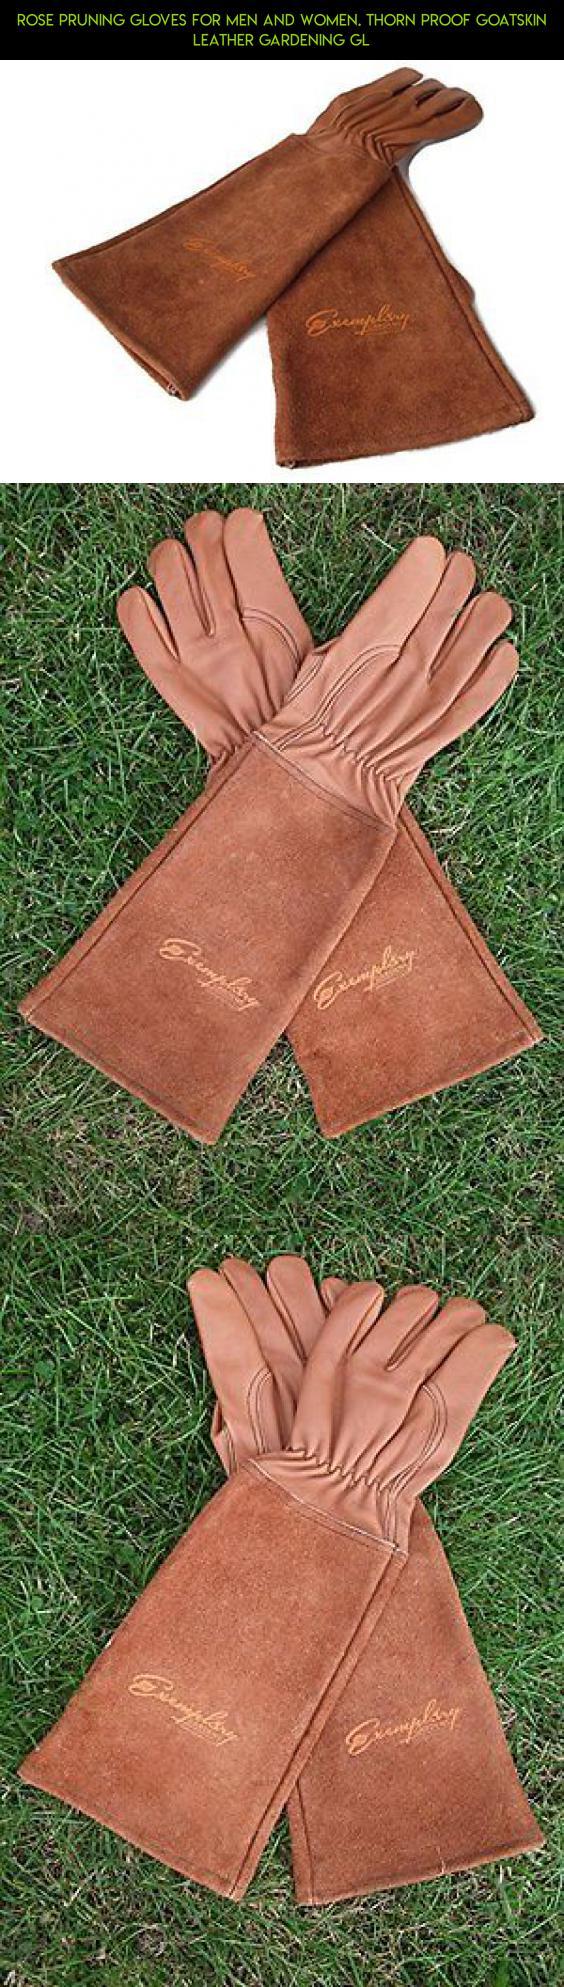 Rose Pruning Gloves For Men And Women. Thorn Proof Goatskin Leather  Gardening Gl #kit